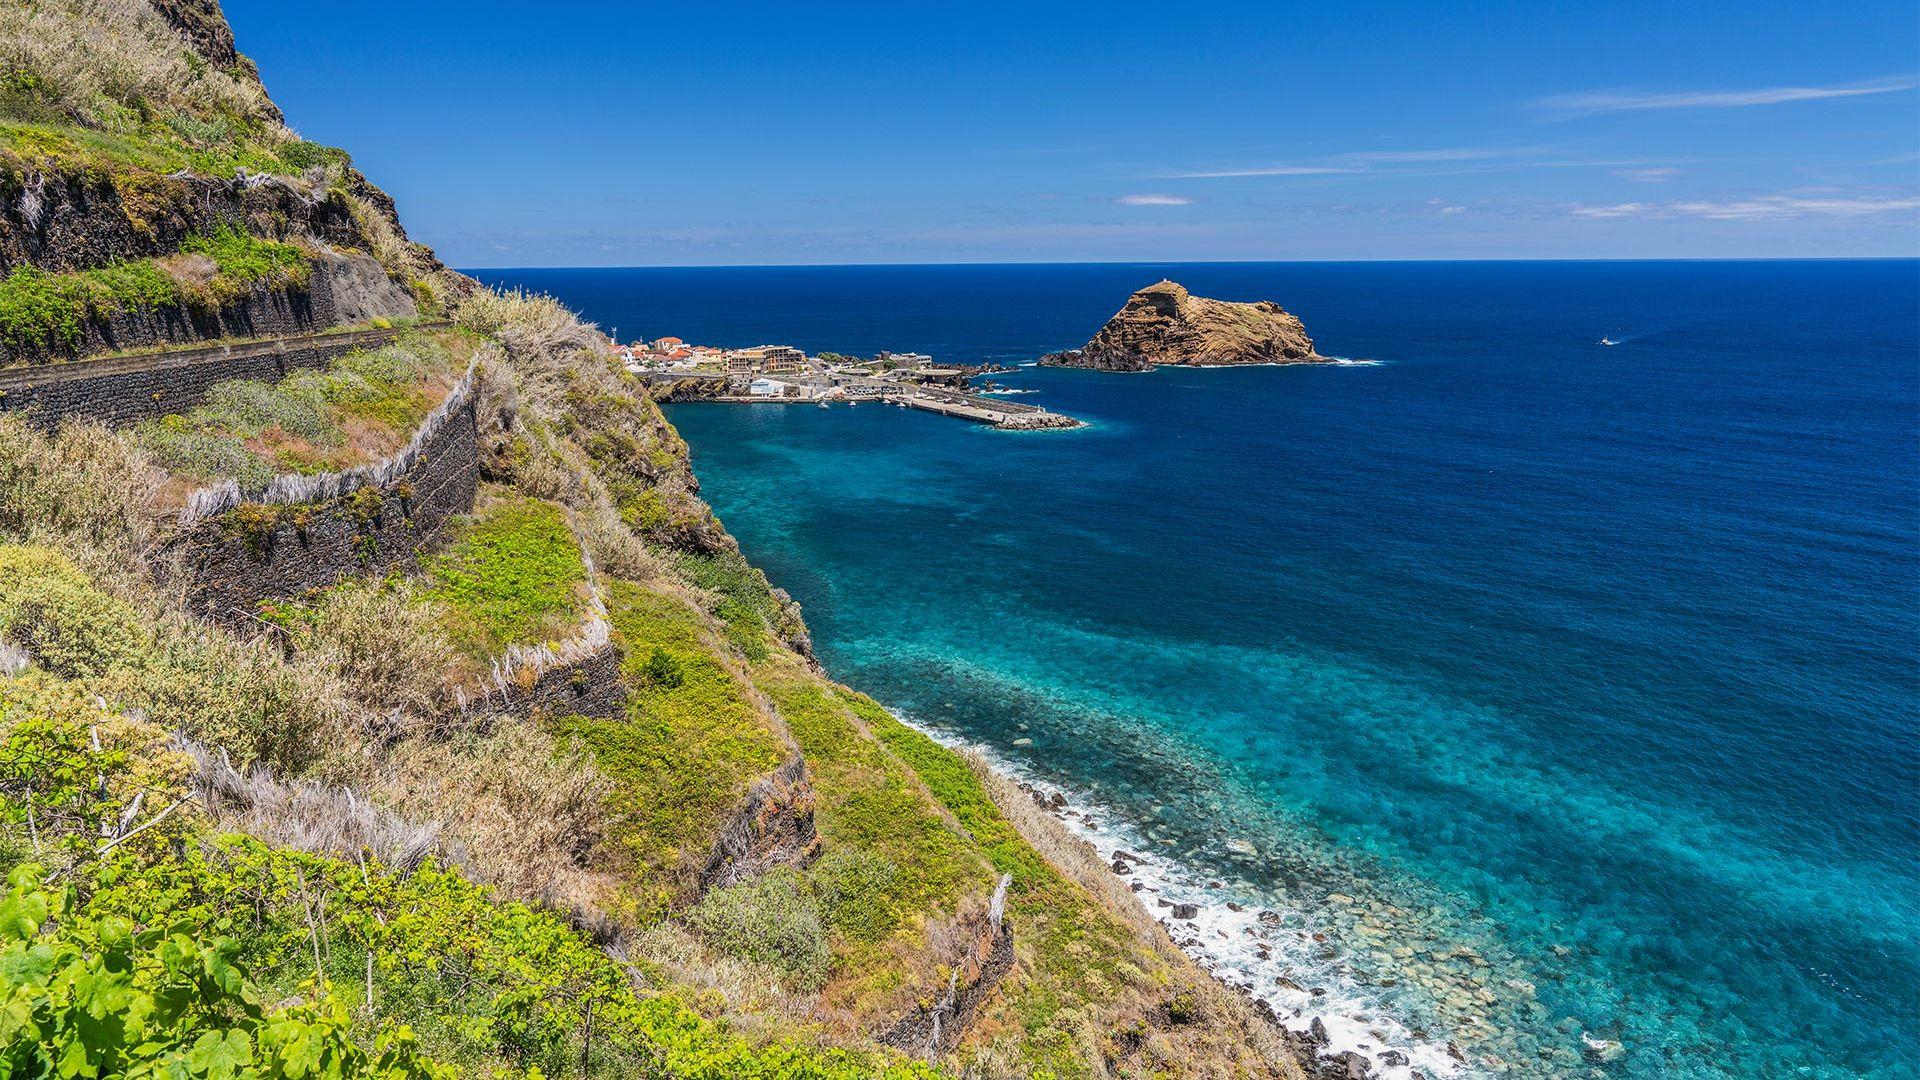 Sejur Charter Madeira, 8 zile - ianuarie 2022